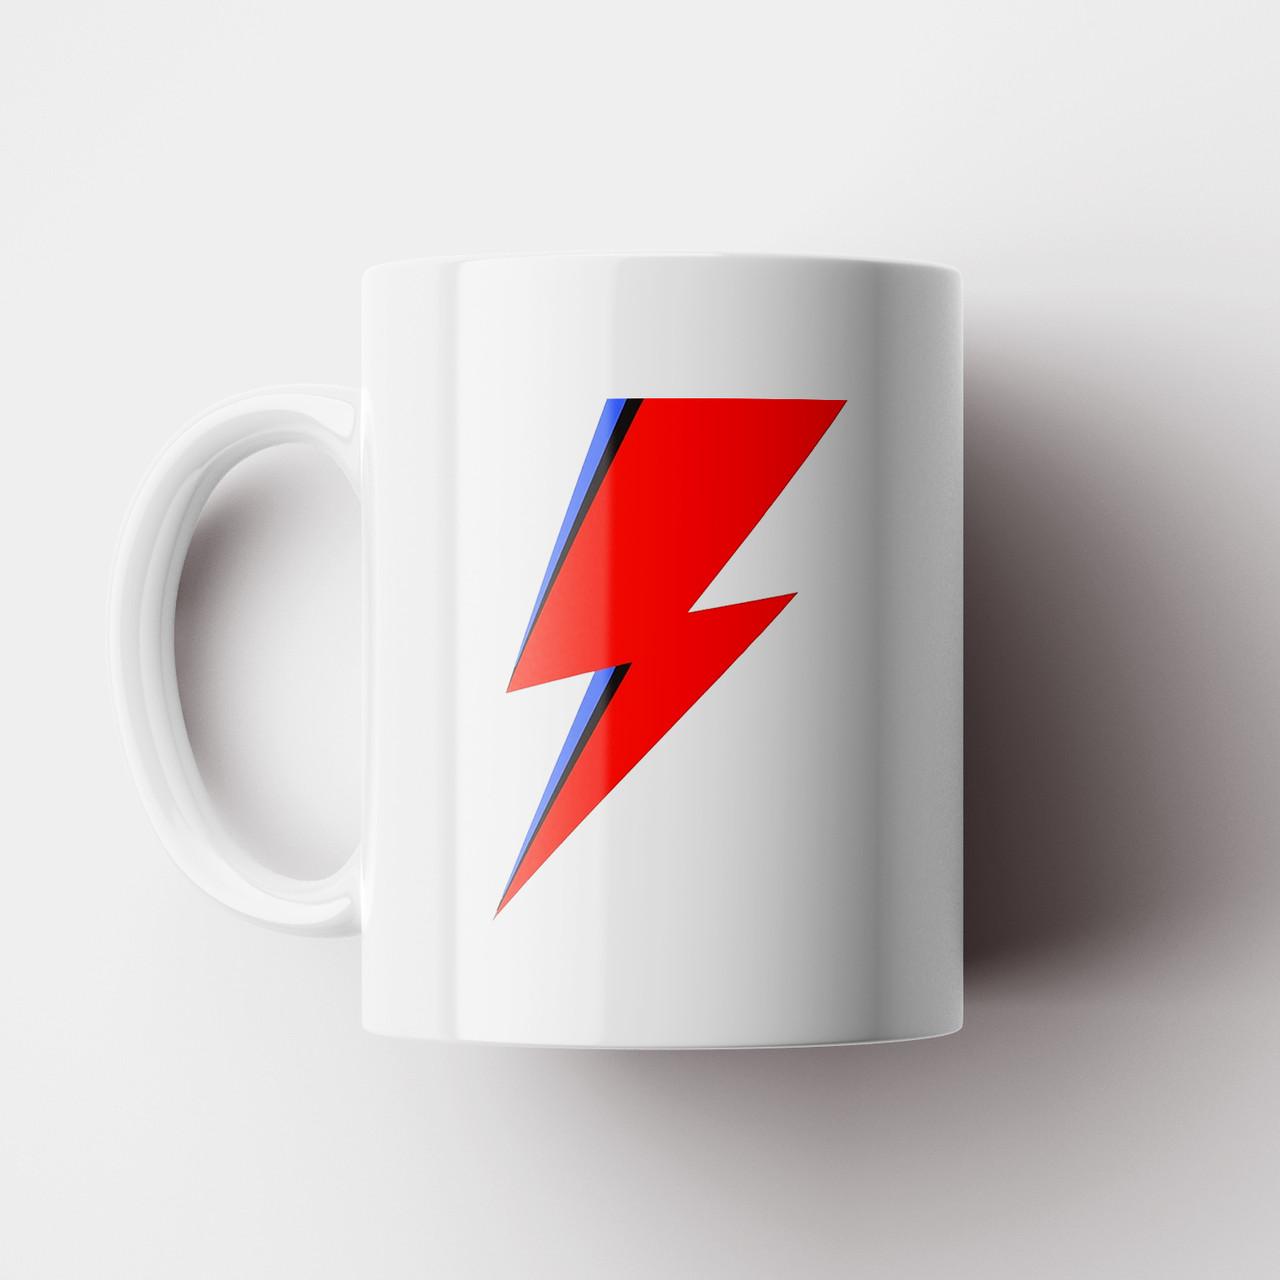 Чашка David Bowie. Рок Музыка. Rock. Кружка Дэвид Боуи